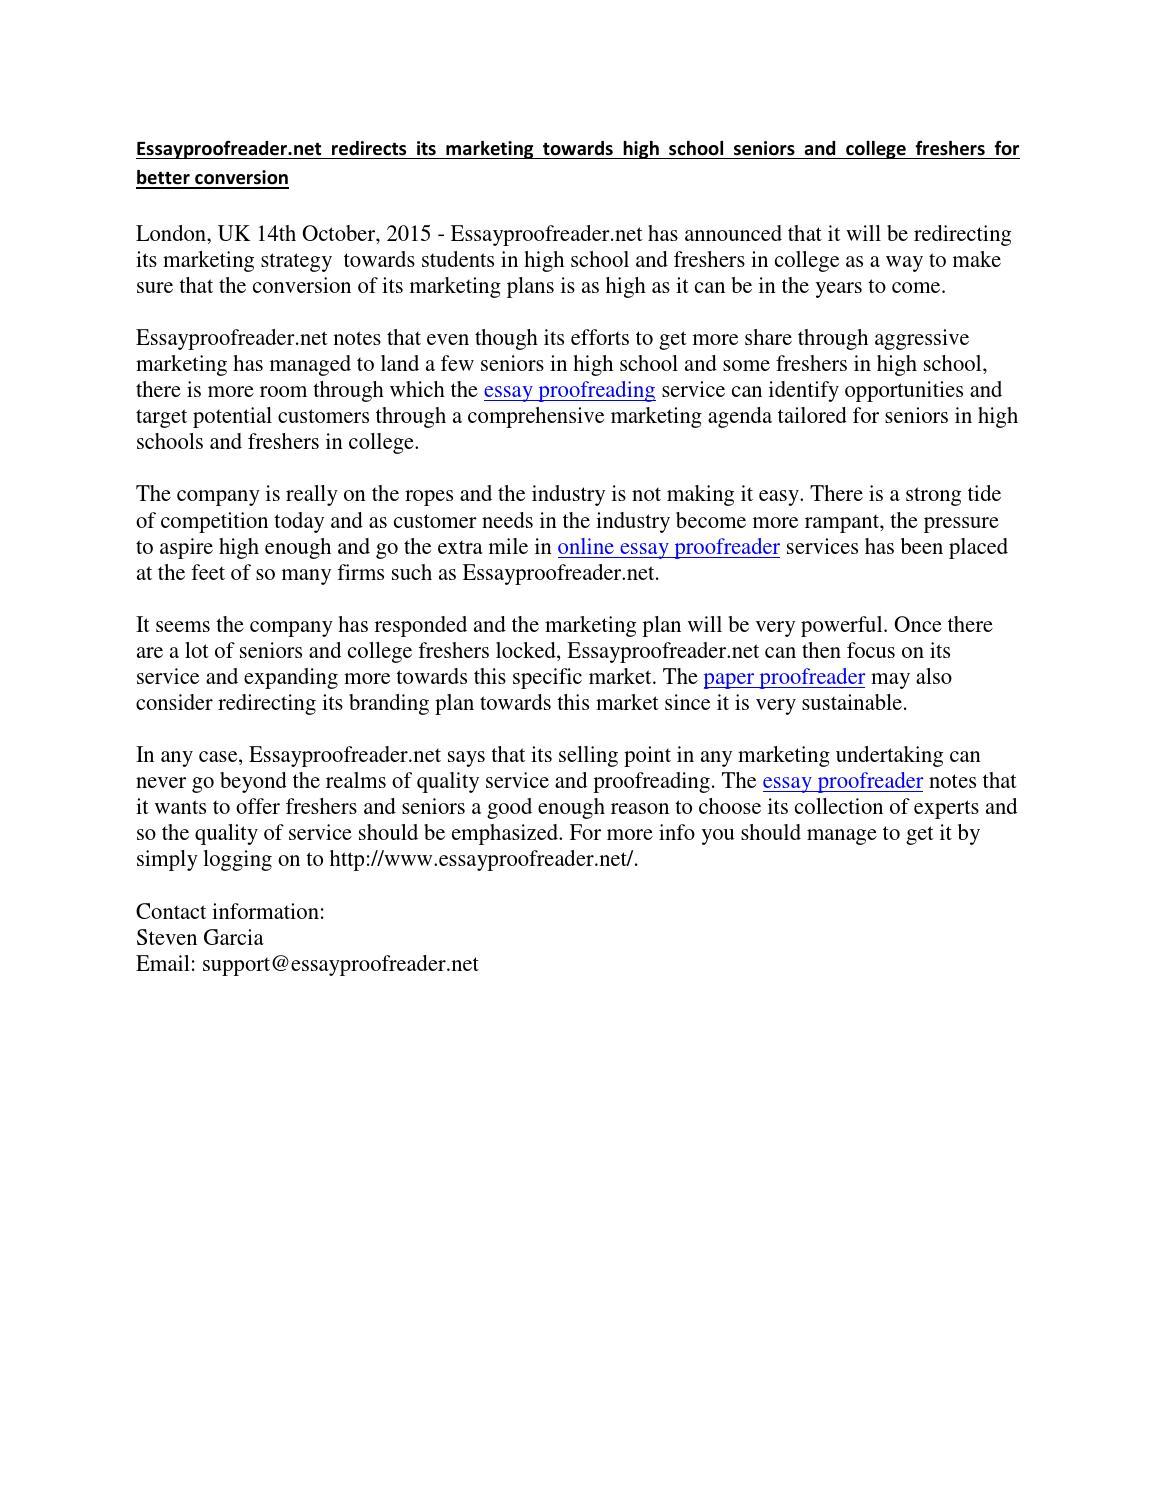 Dissertation proofreading service birmingham